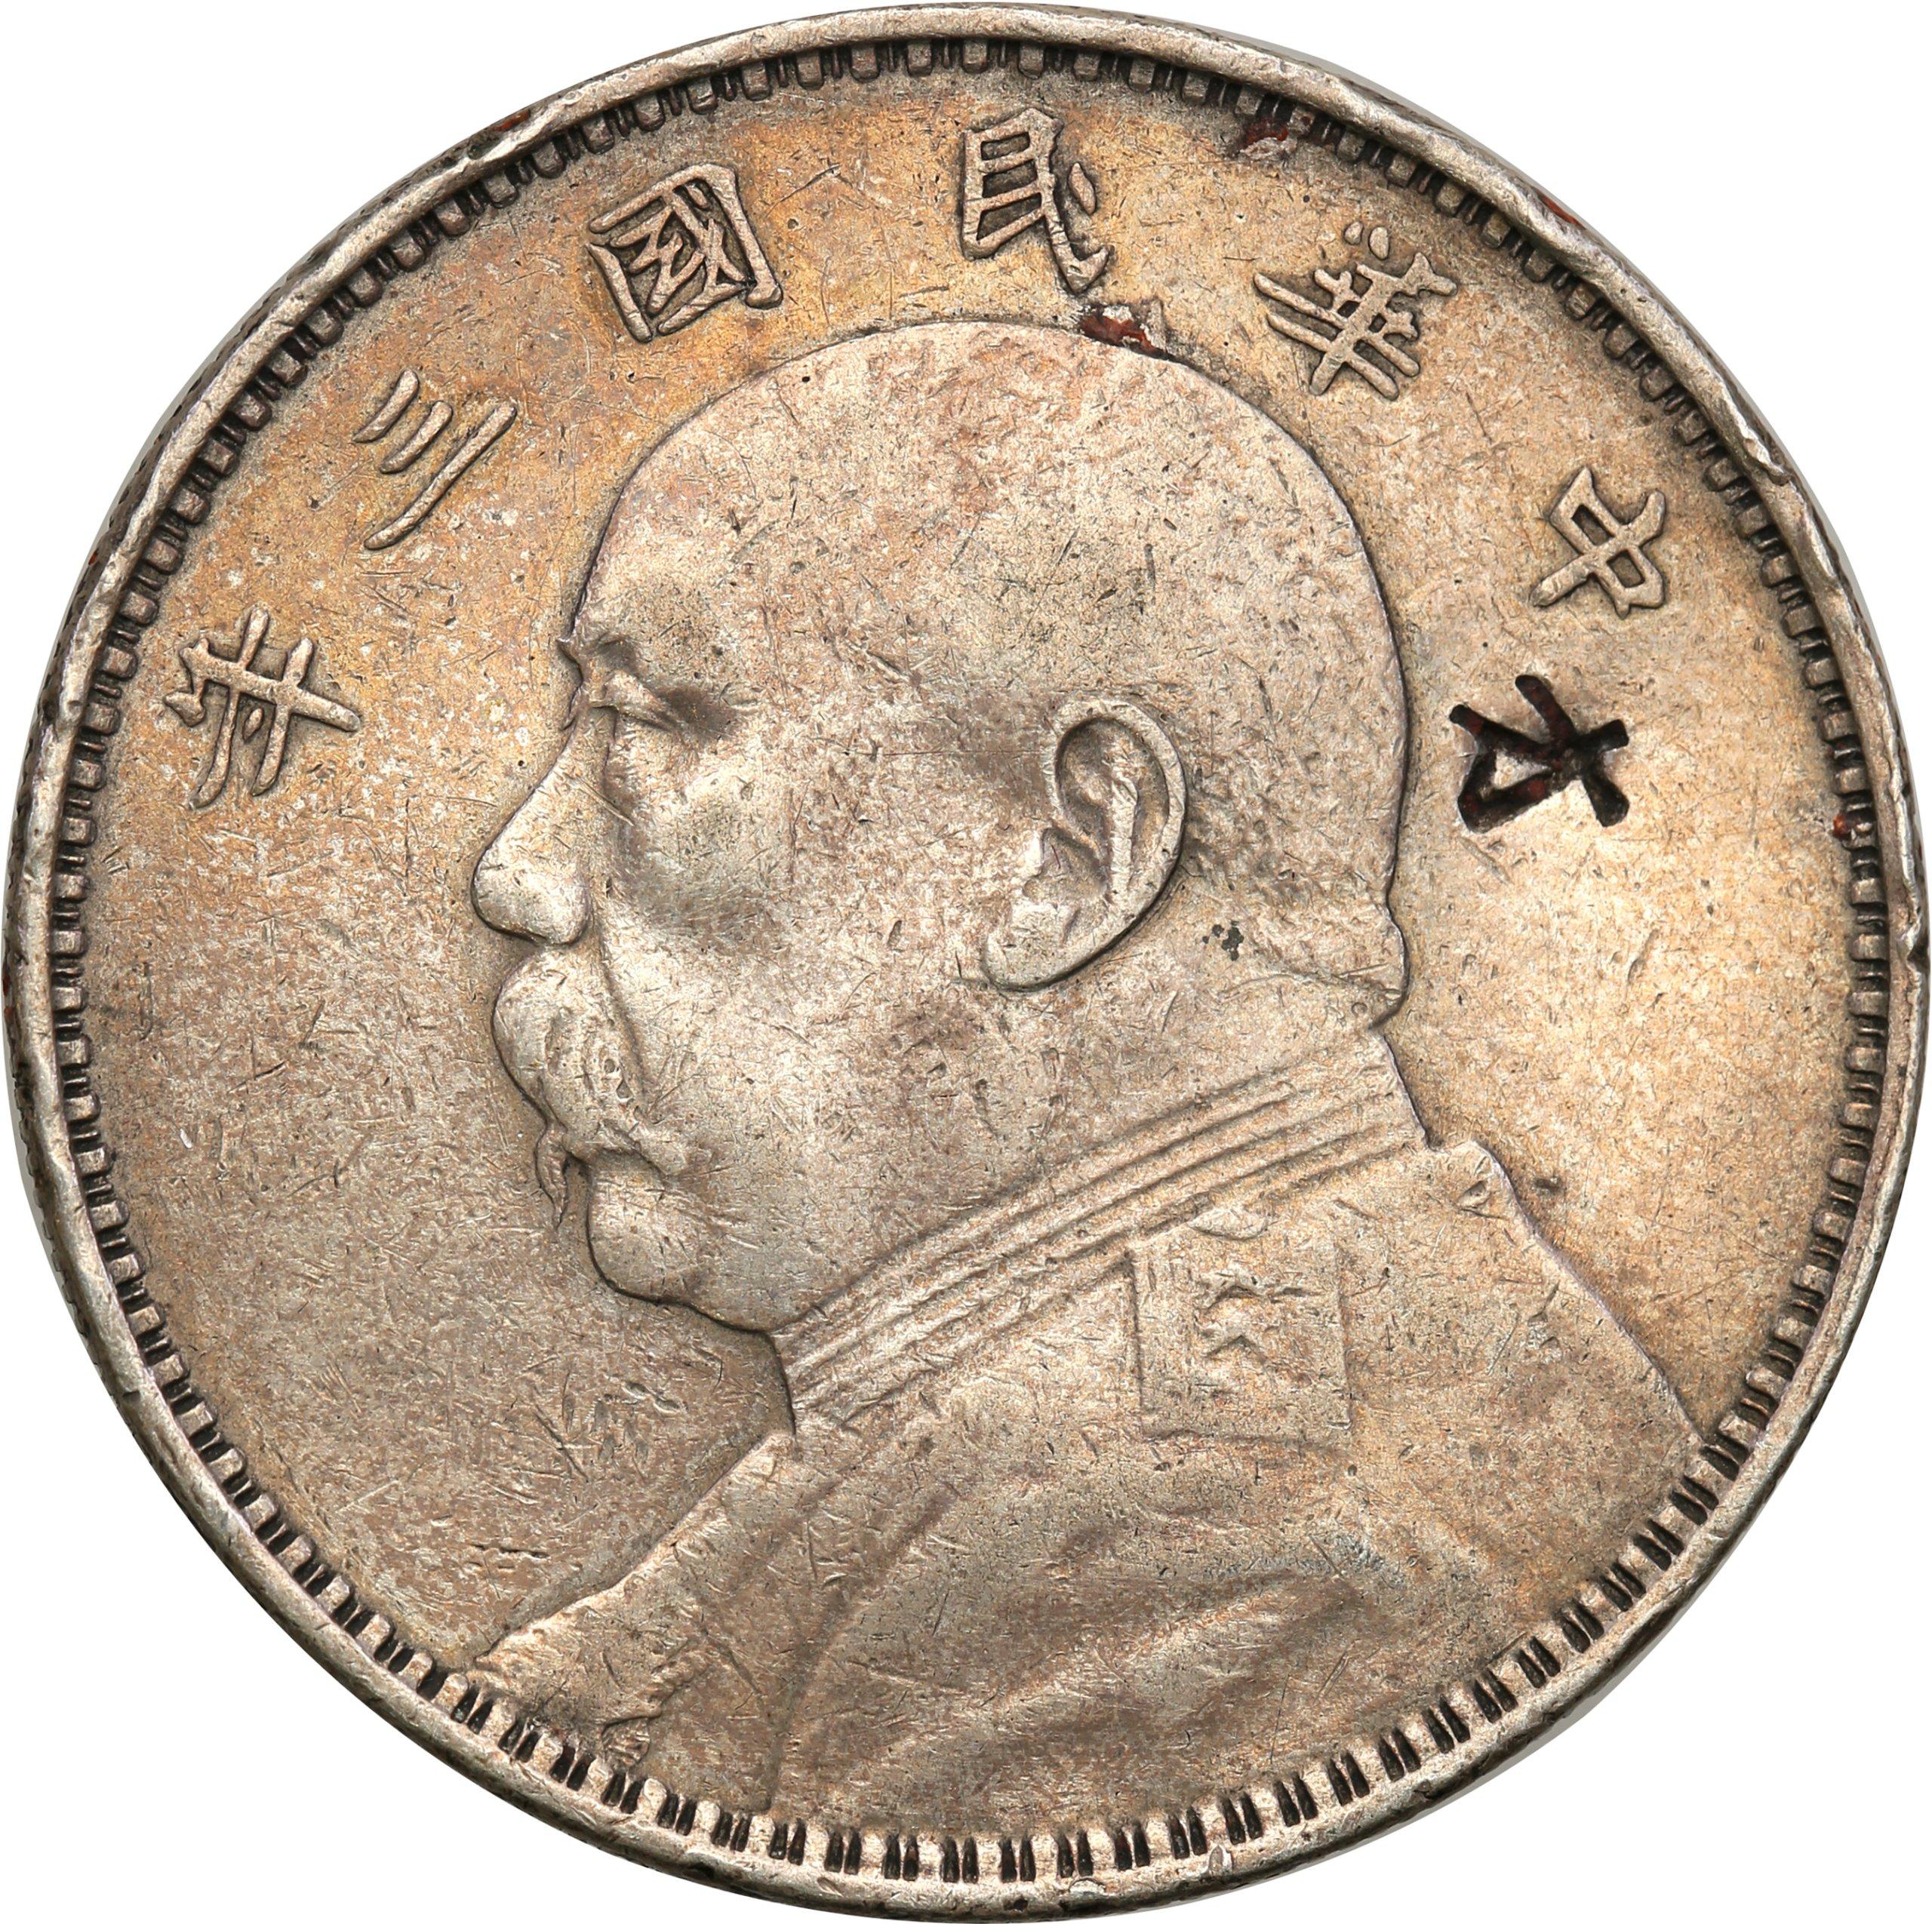 Chiny Repub. 1 Yuan (dolar) b.d. (1914) st.3 PUNCA